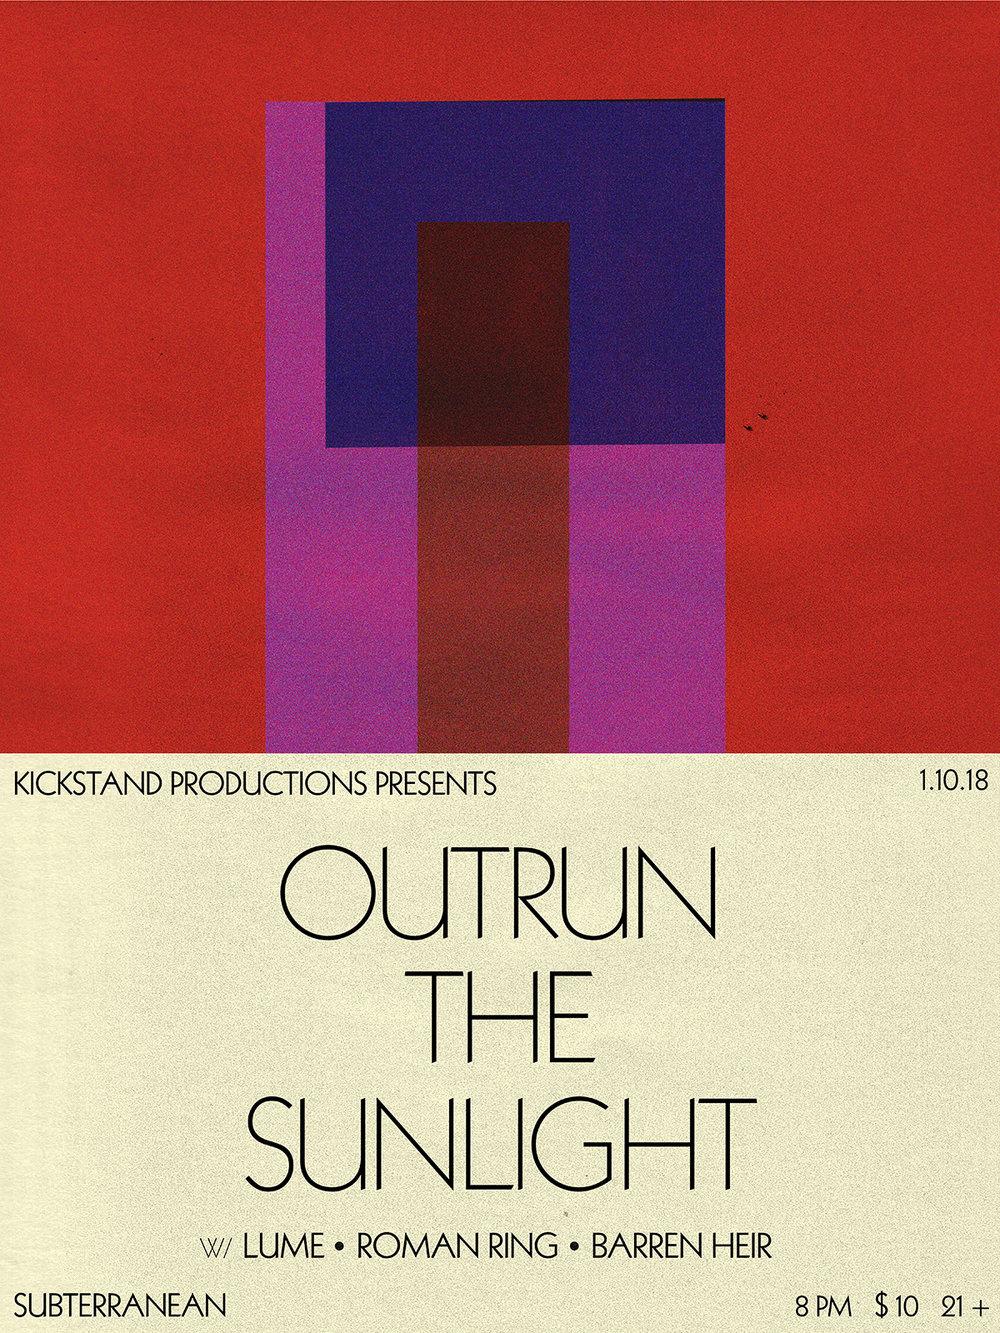 Outrun the Sunlight Headline